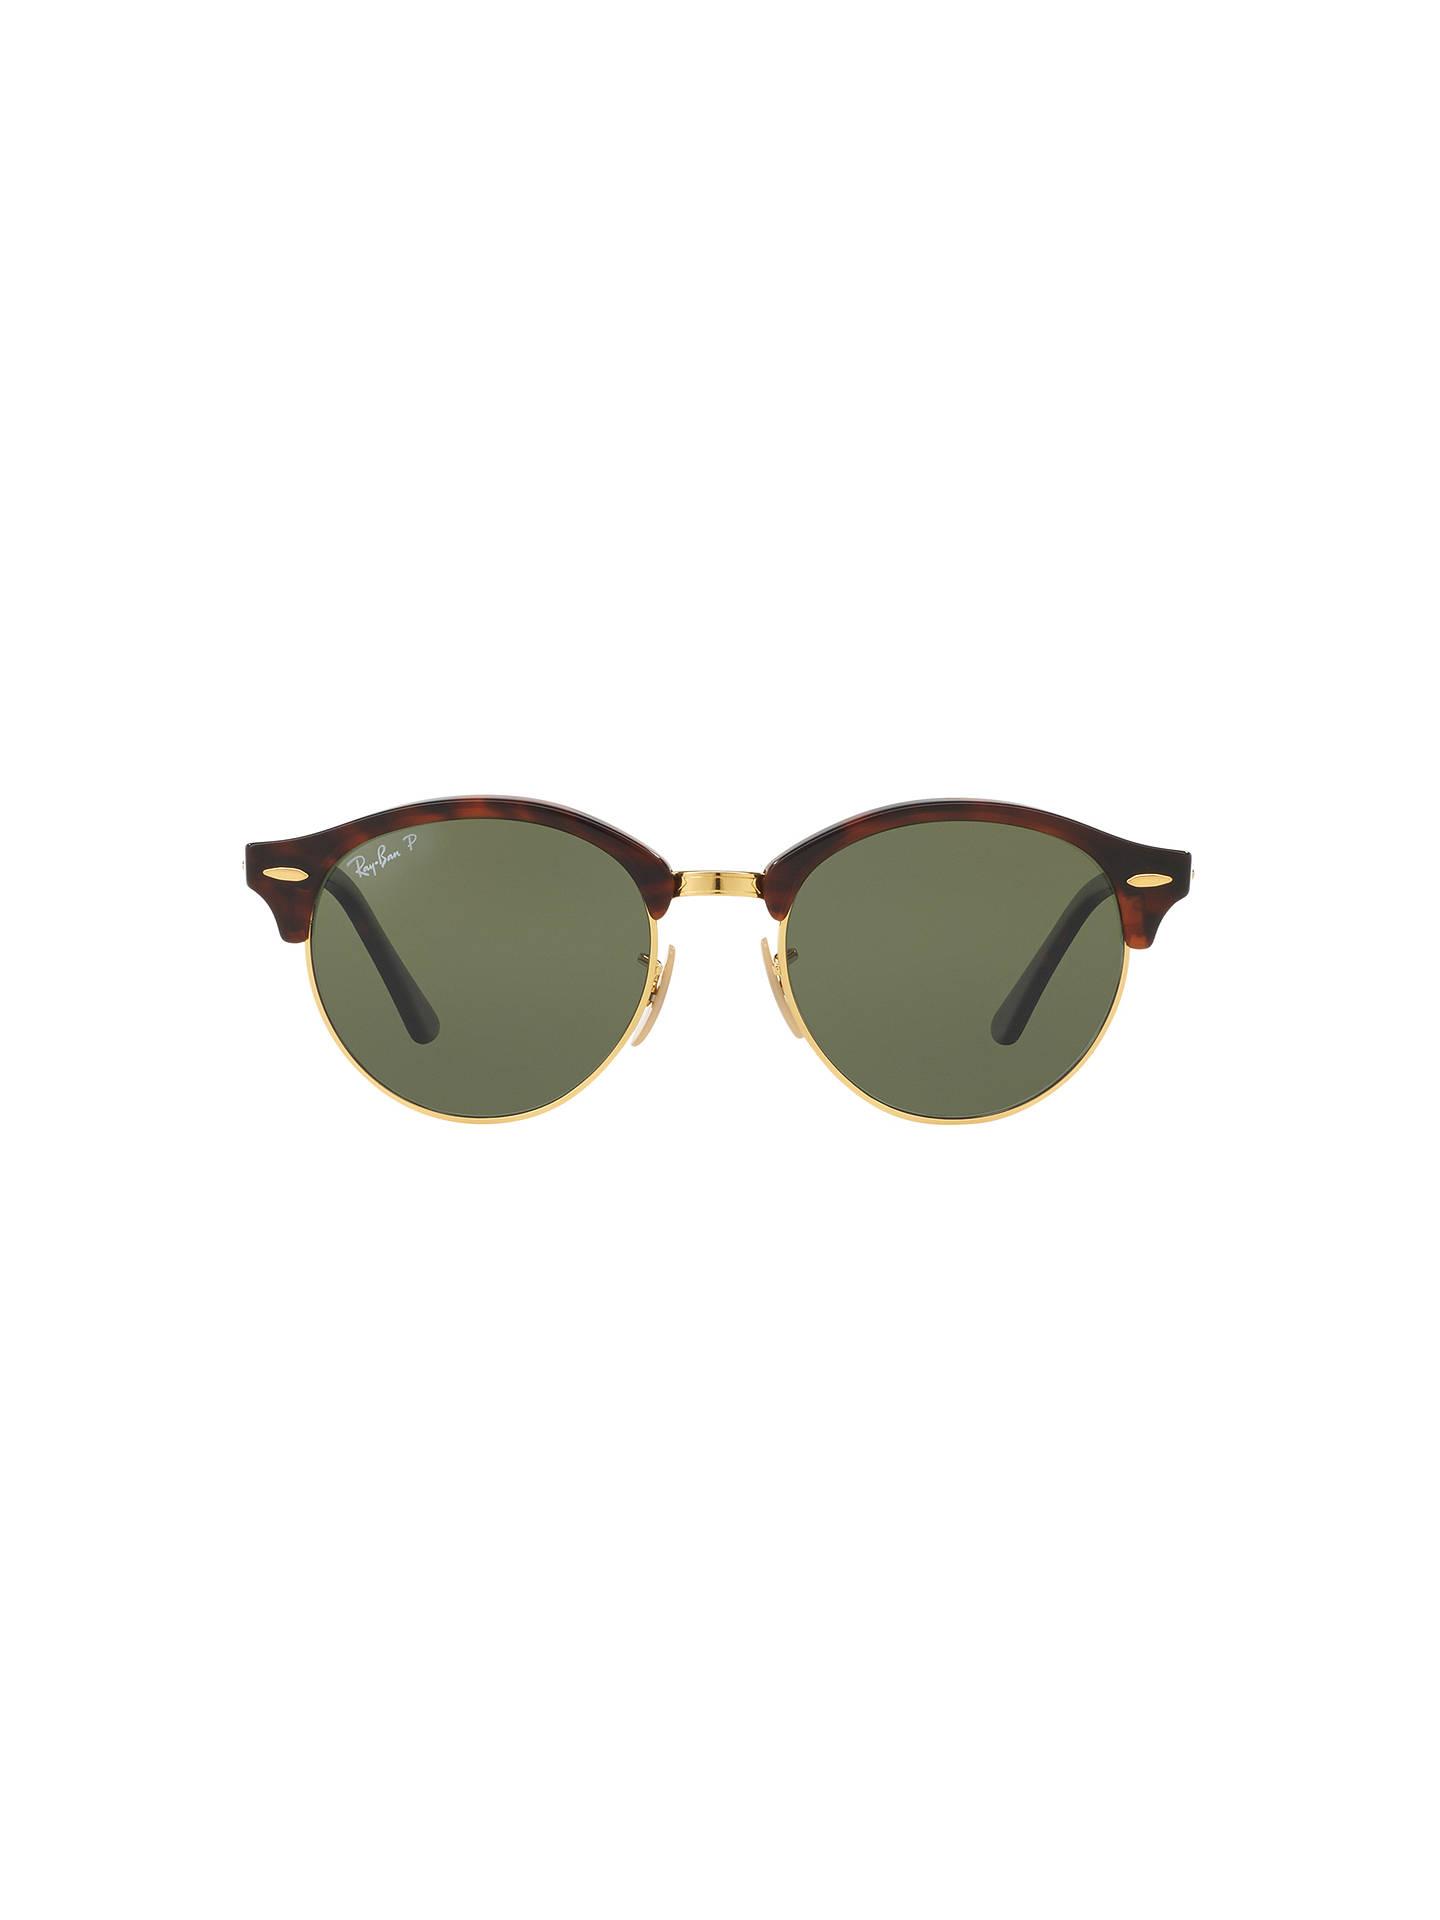 10c9129c58c86 Ray-Ban RB4246 Clubround Polarised Round Sunglasses at John Lewis ...